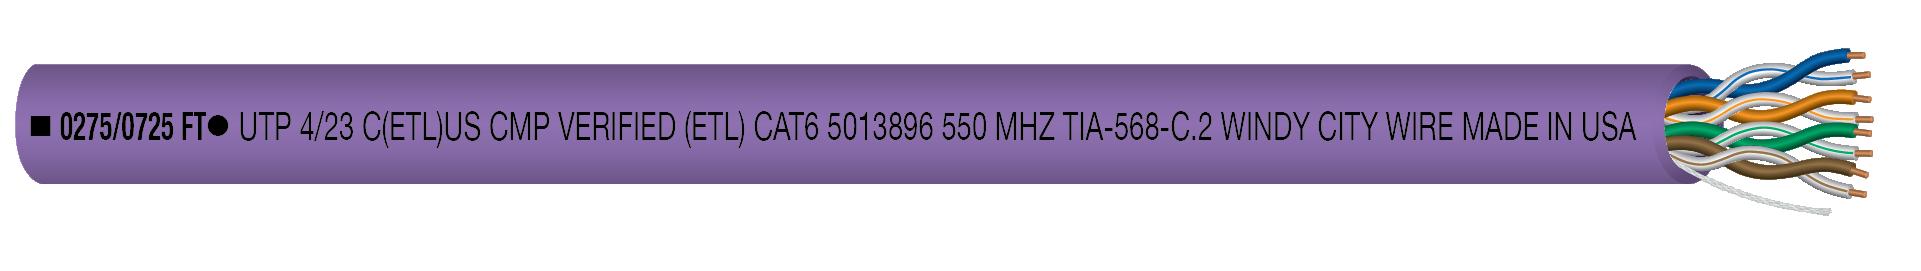 5566050